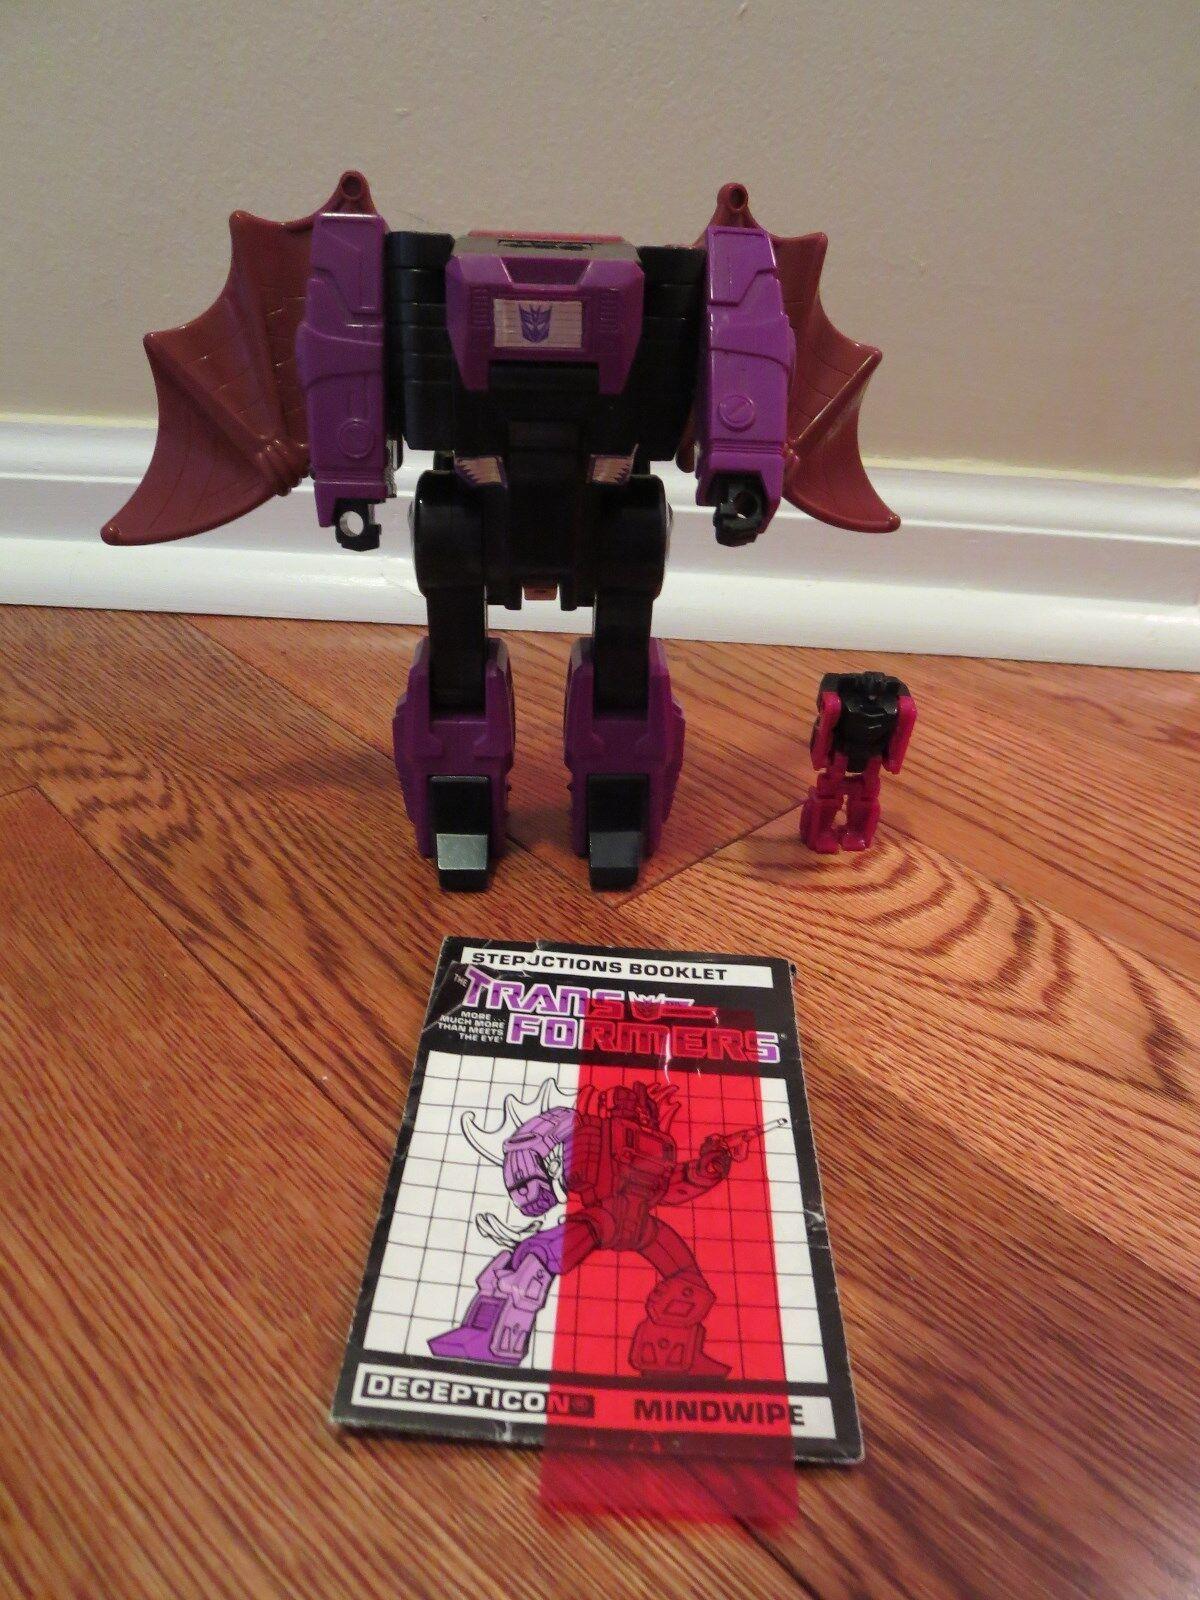 Mindwipe Director  casi completa 1987 Vintage Hasbro G1 Transformers